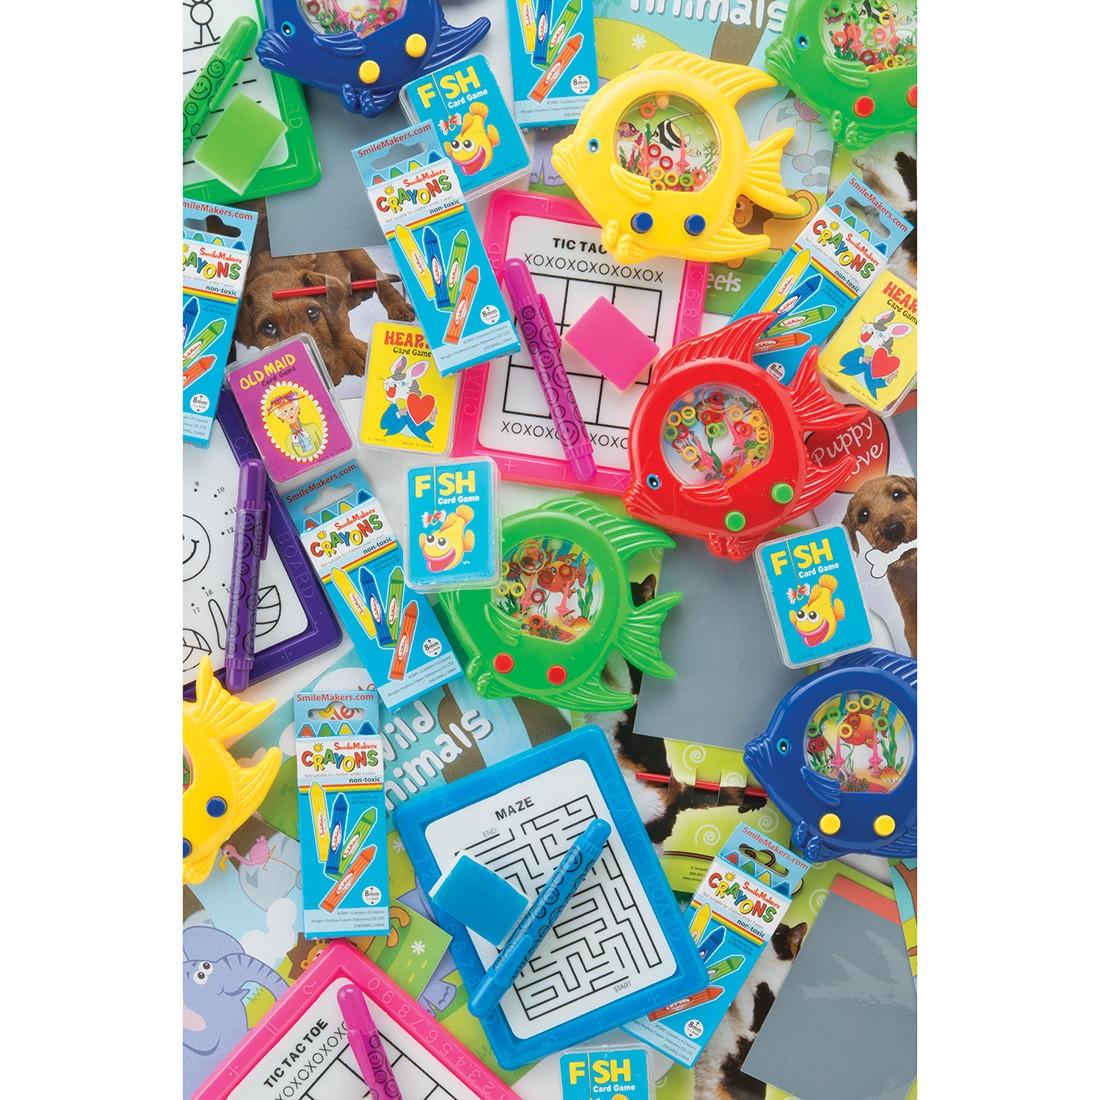 Kids Activity Treasure Chest Refill [image]